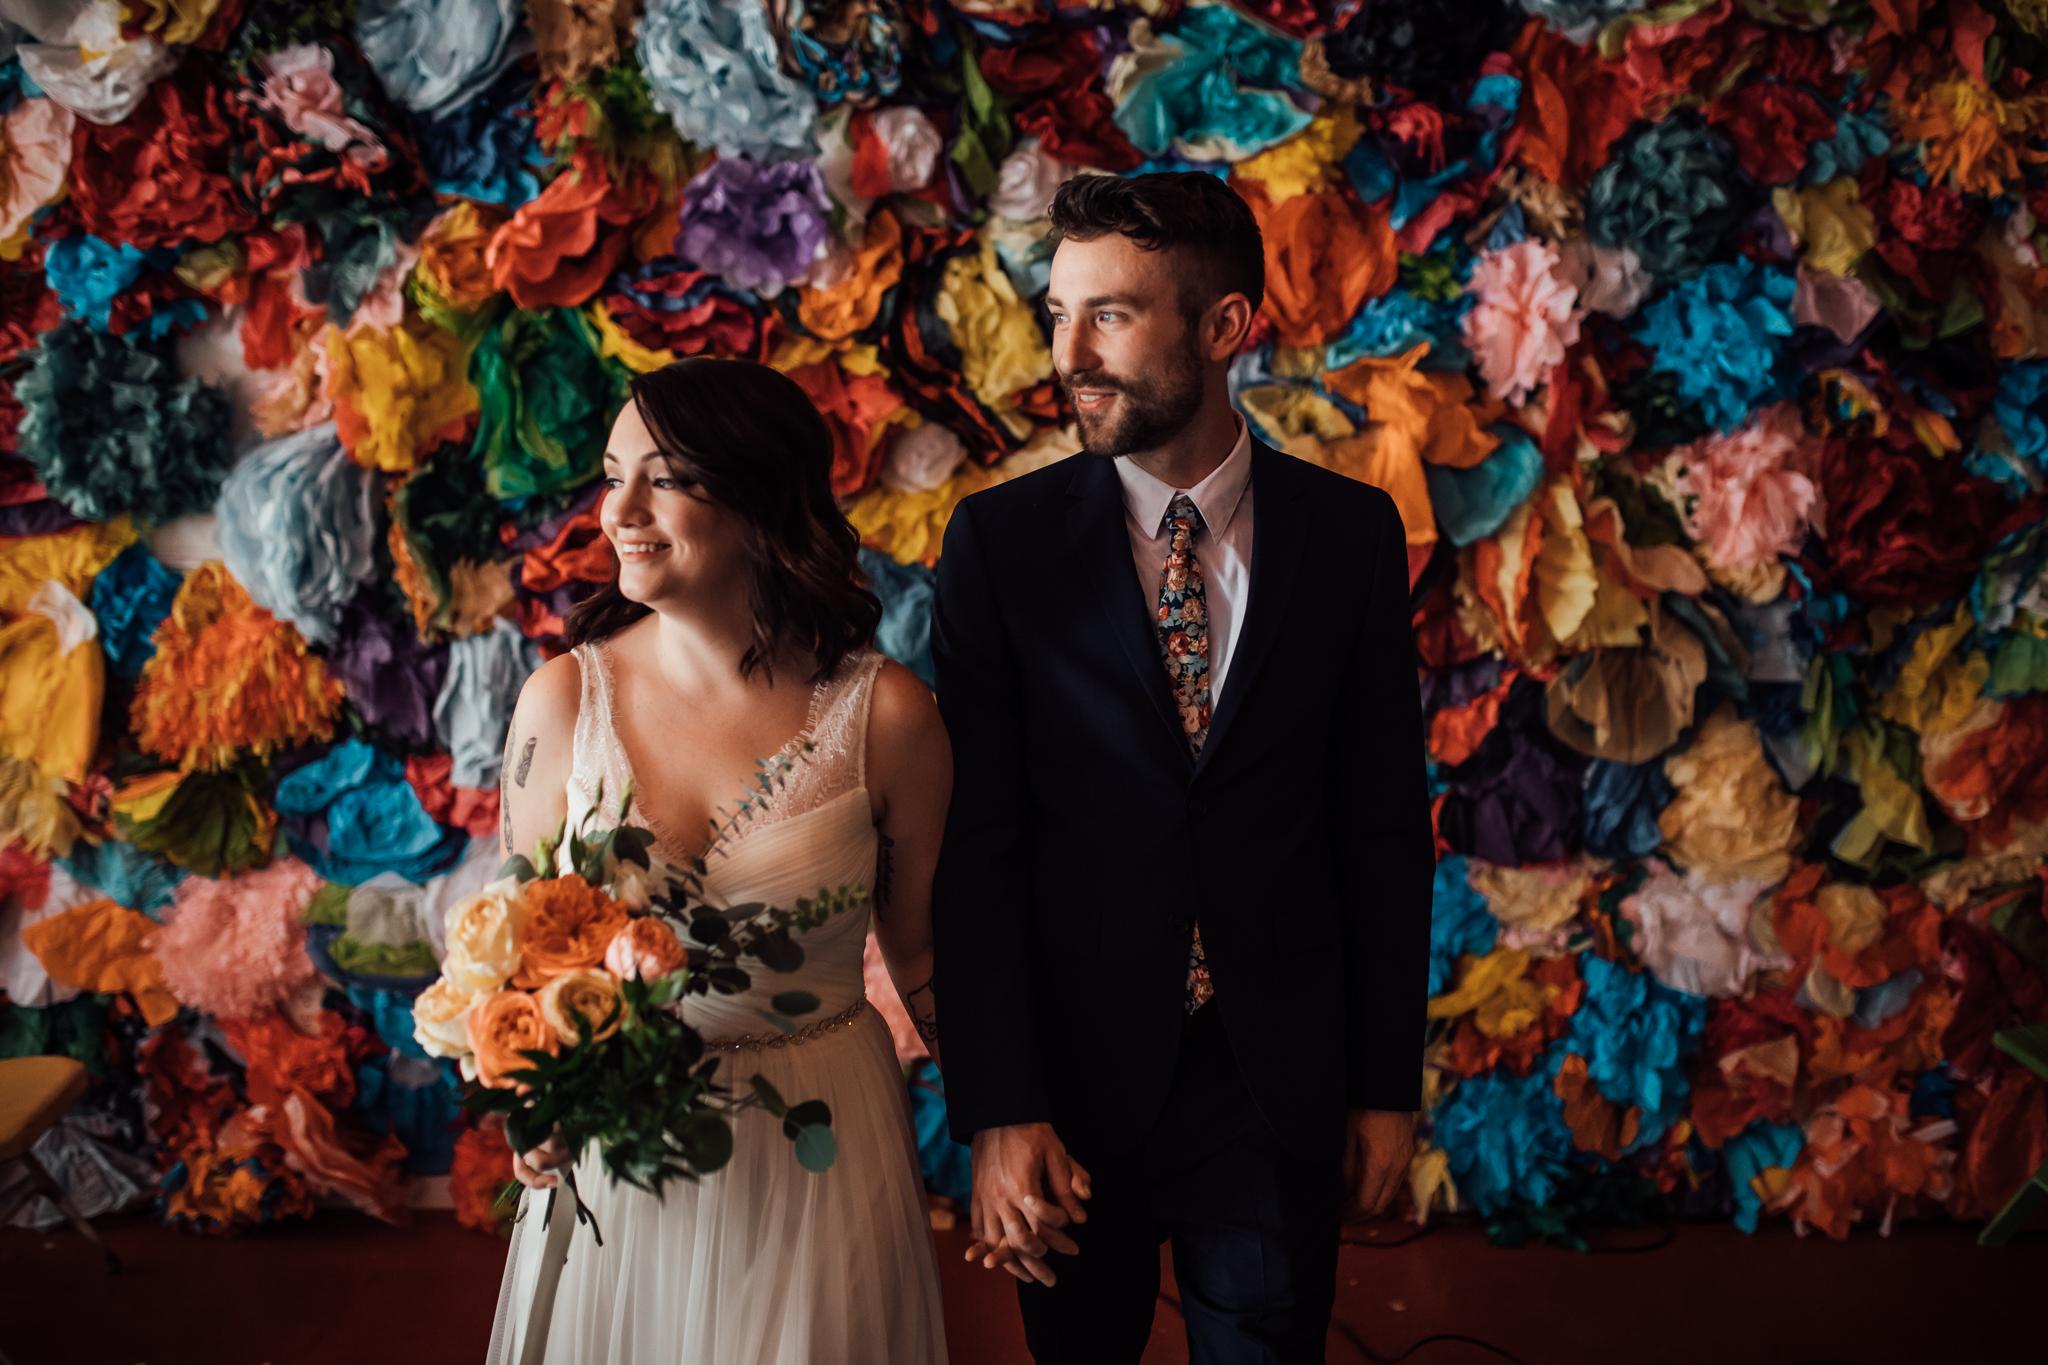 thewarmtharoundyou-amurica-studio-wedding-colorful-unique-wedding (39 of 47).jpg